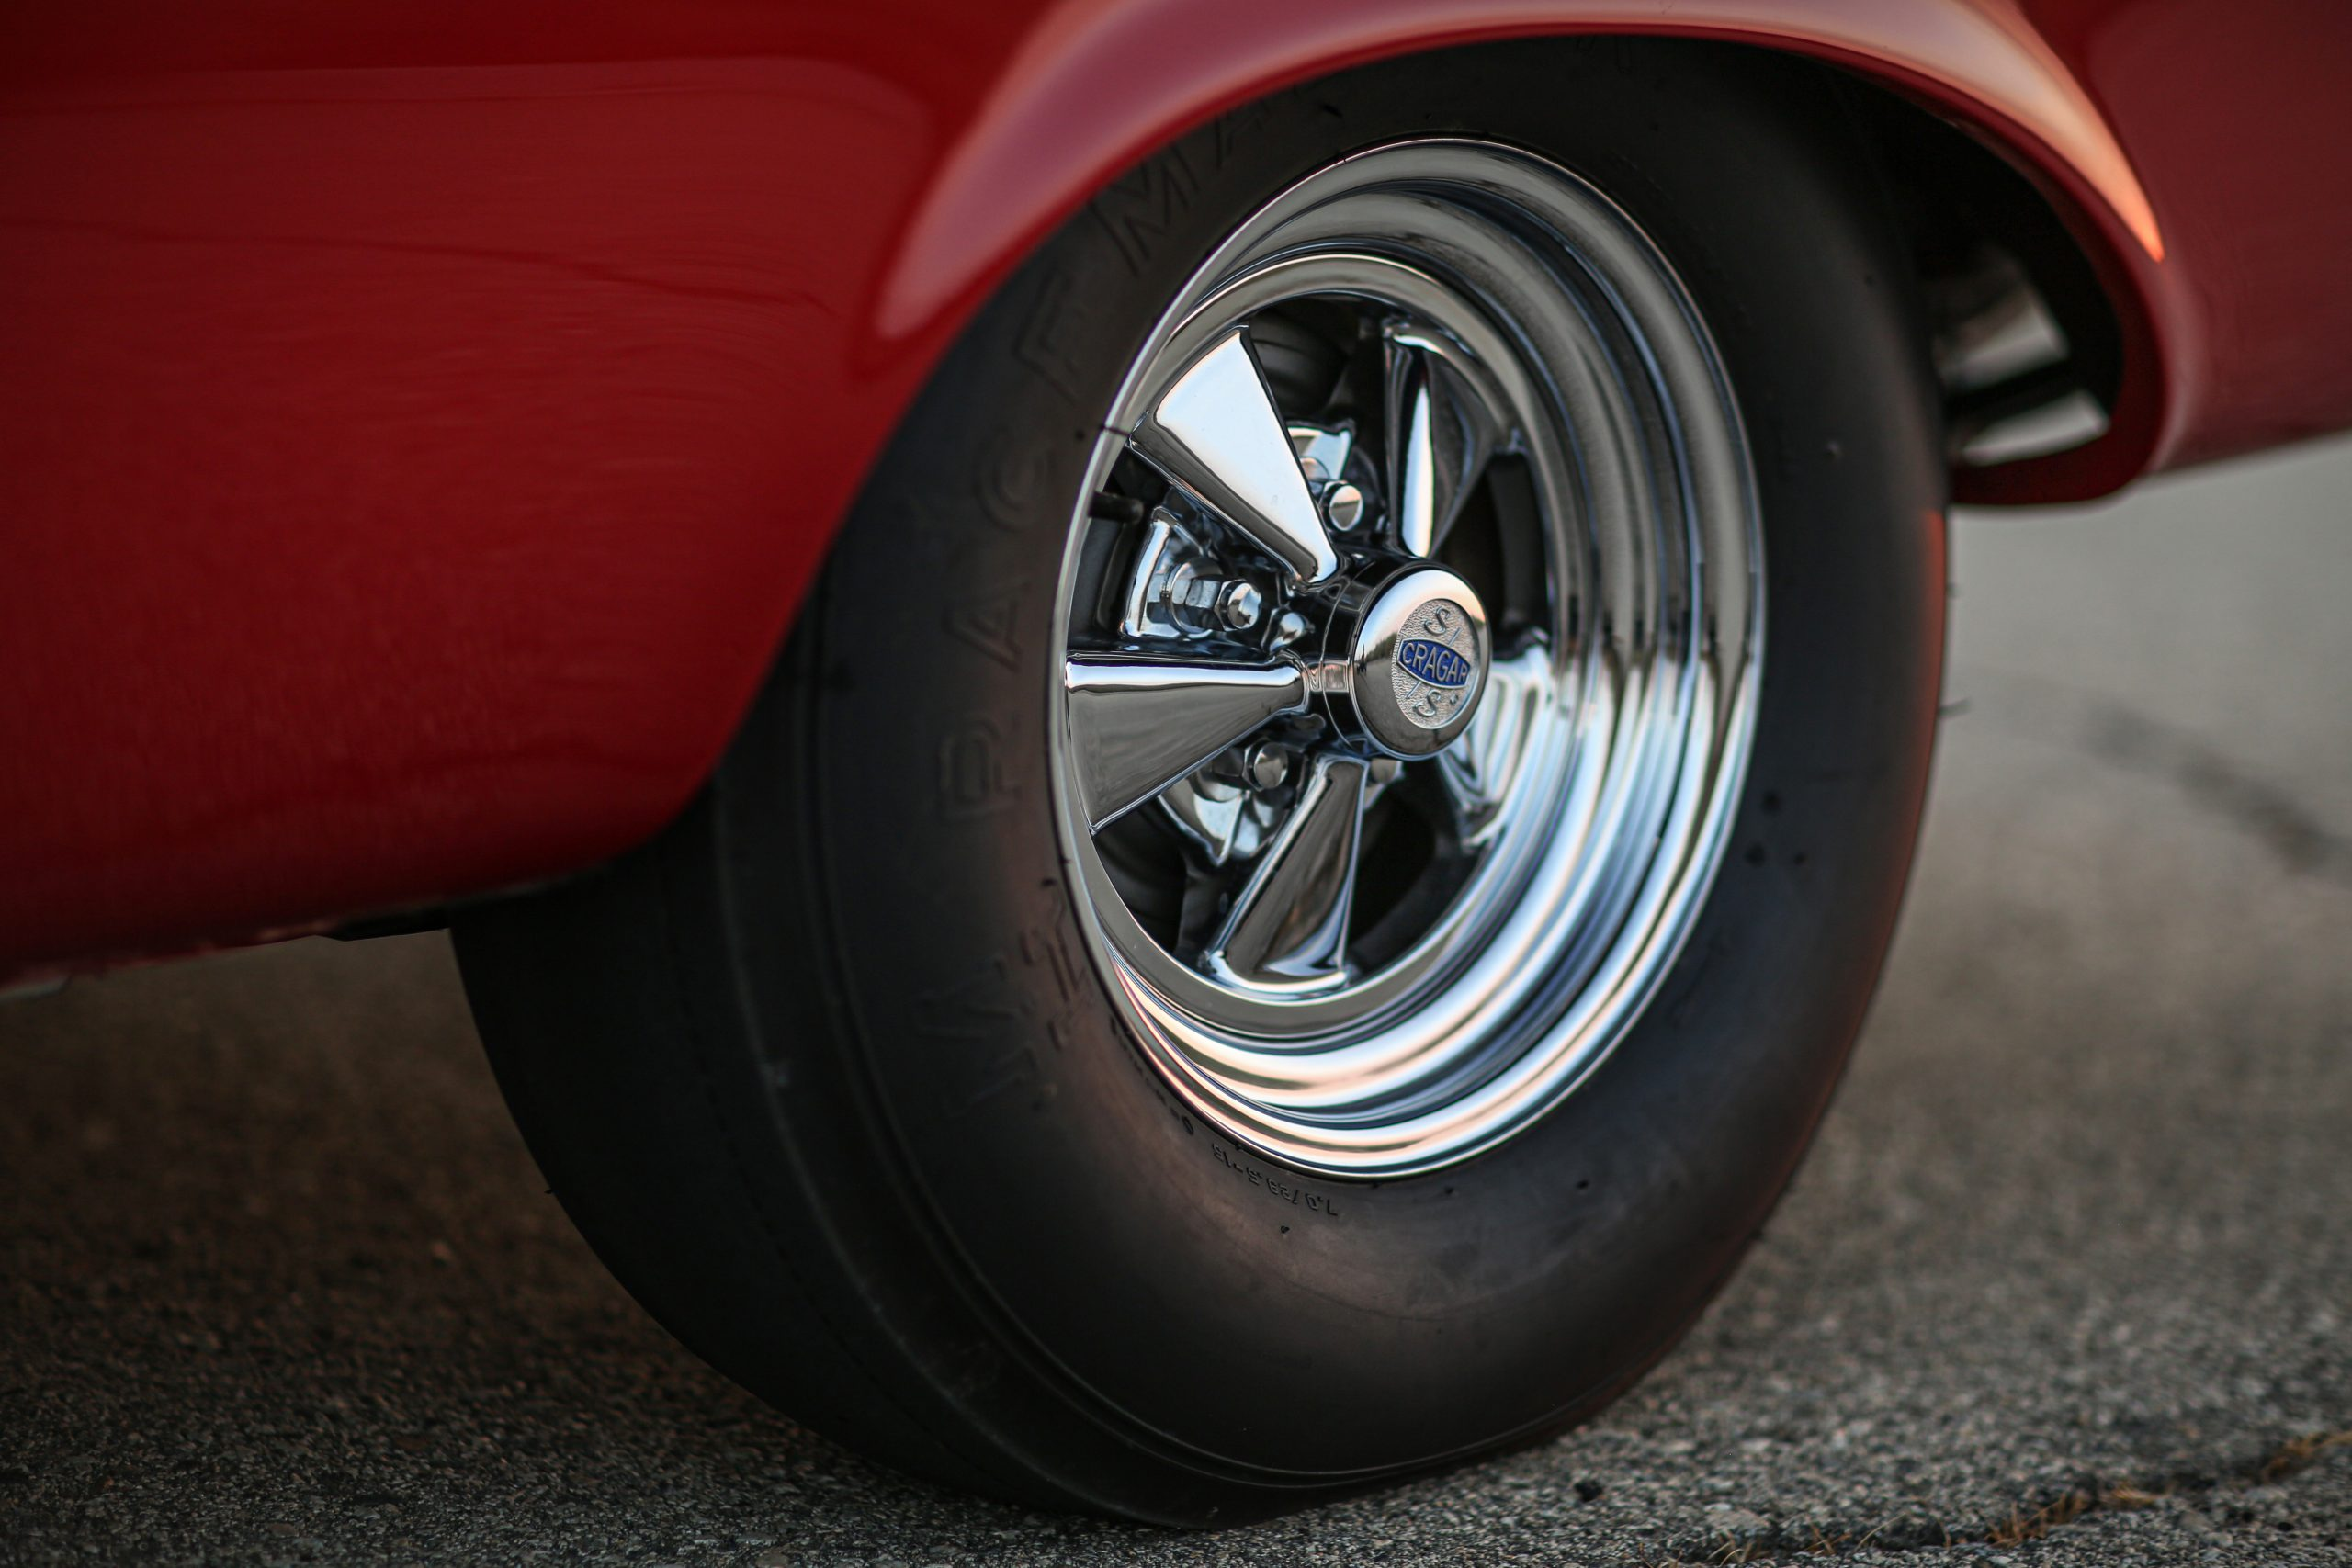 1963 Plymouth 426 Max Wedge lightweight Cragar SS